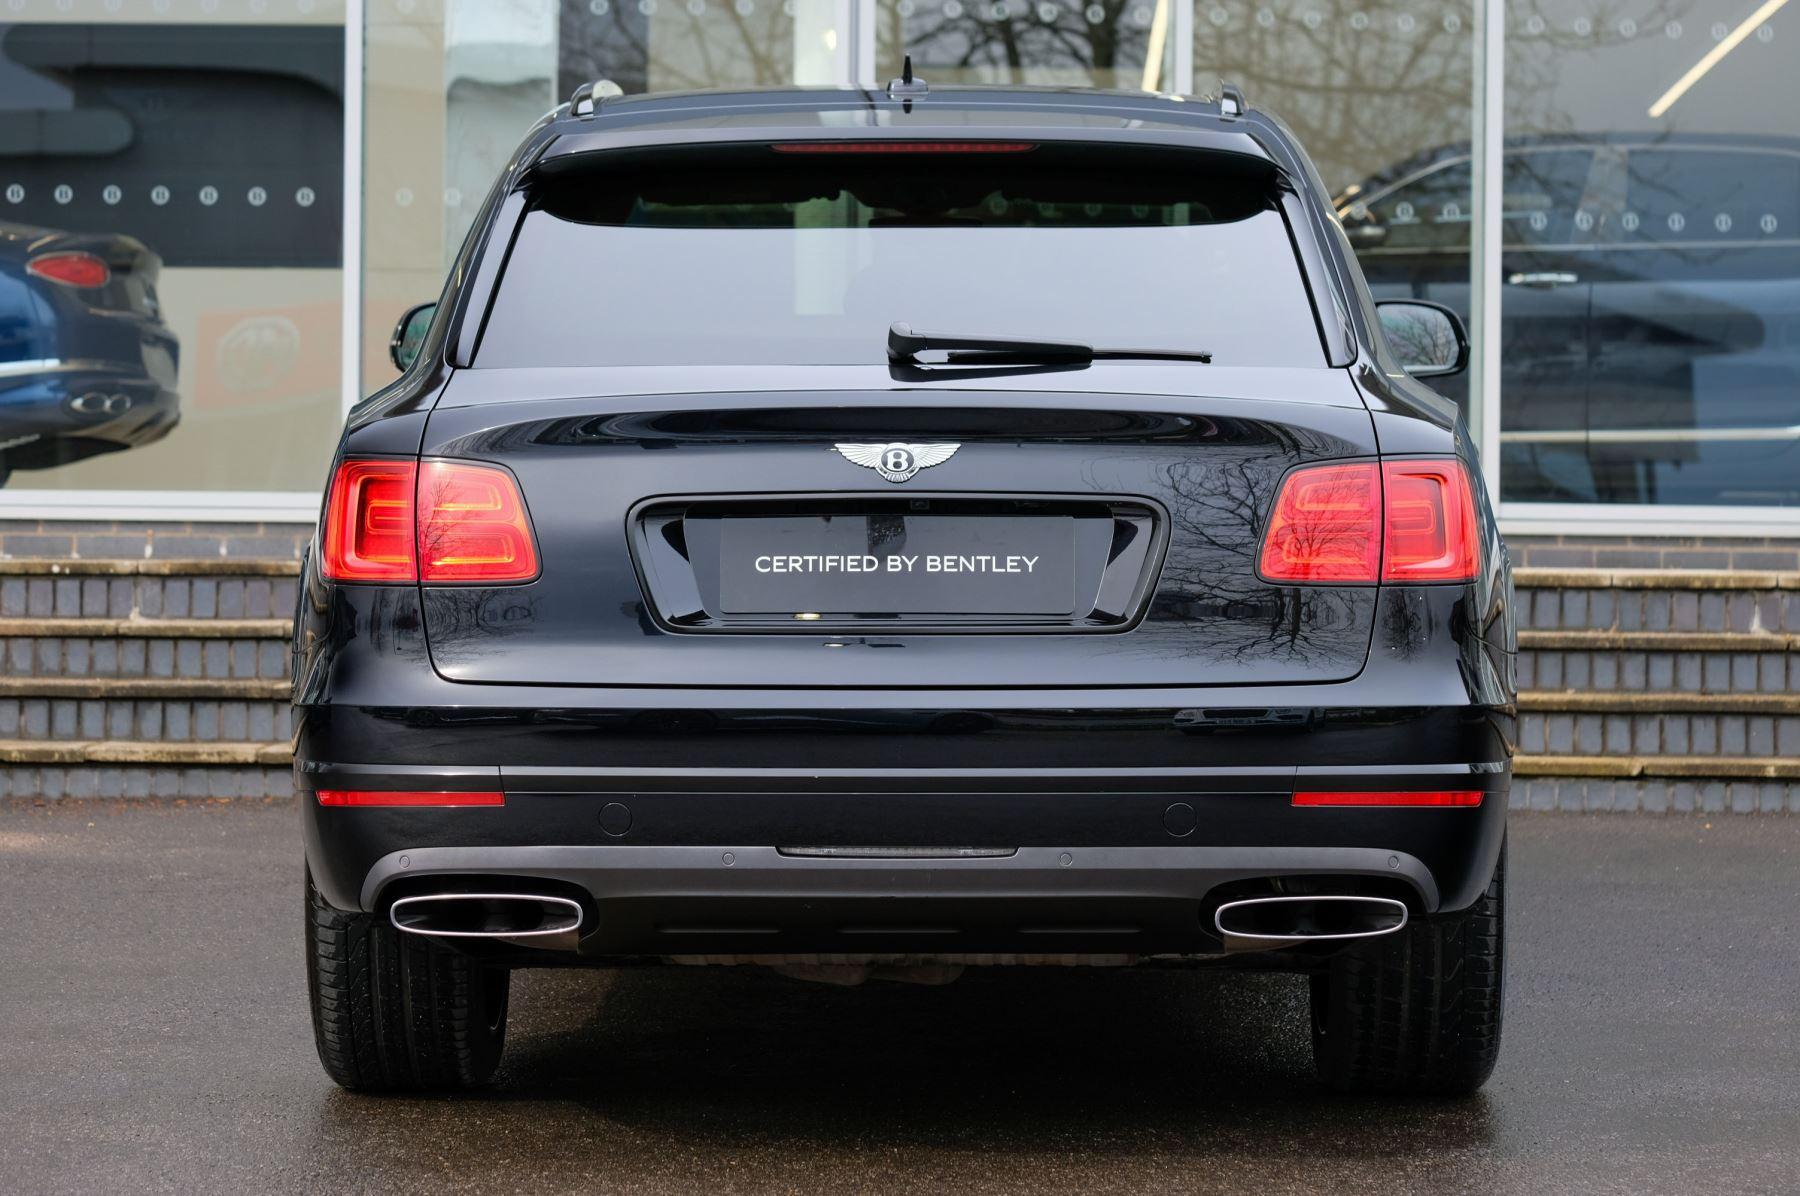 Bentley Bentayga 6.0 W12 5dr - Mulliner Driving Specification  image 4